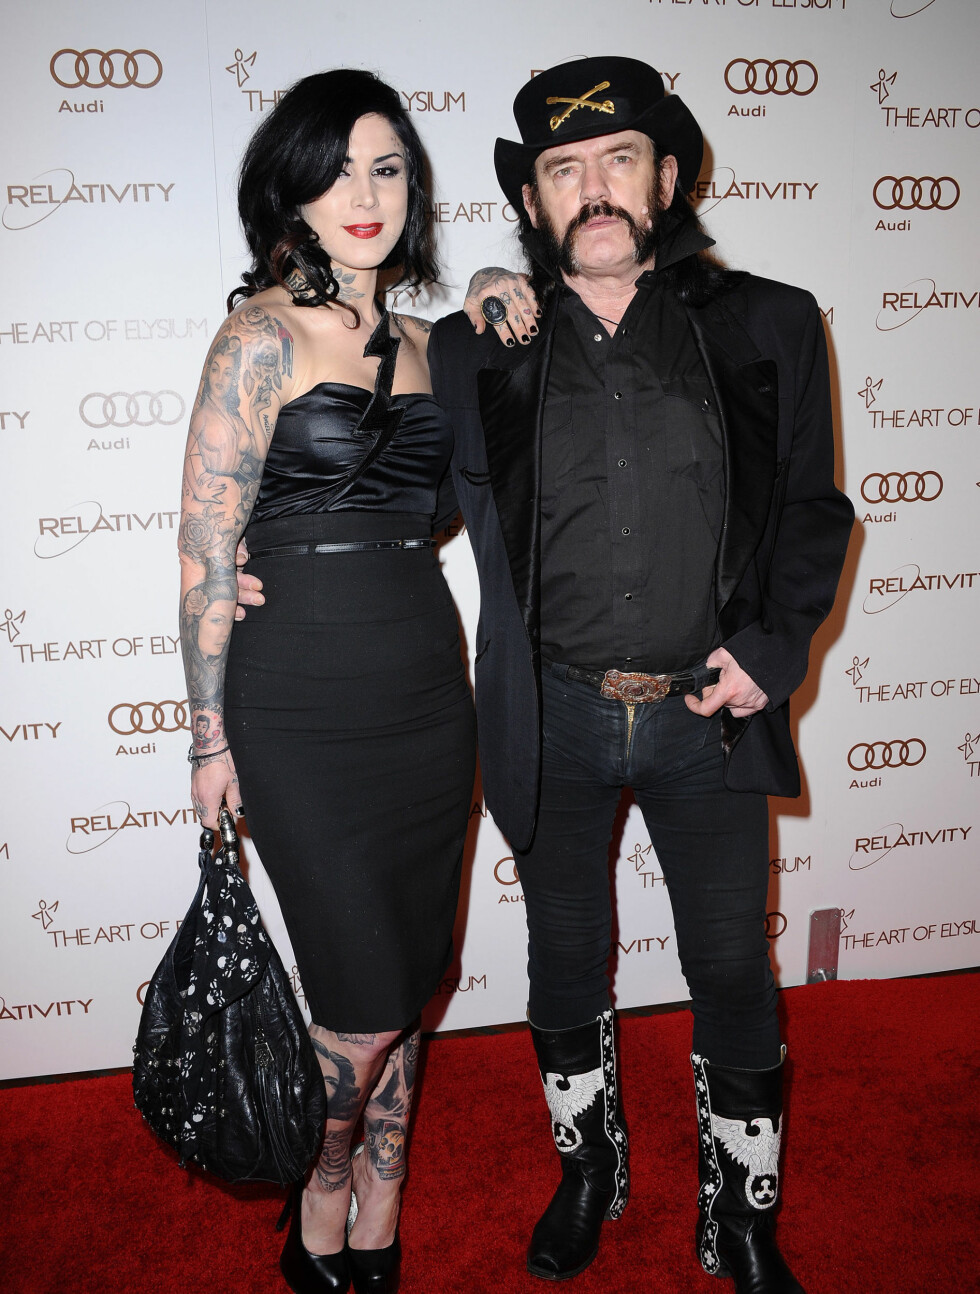 PAR: Kat Von D (29) og Motörhead-Lemmy Kilmister (66) viste seg offentlig sammen for første gang på «Art of Elysium Heaven»-gallaen. Foto: Stella Pictures